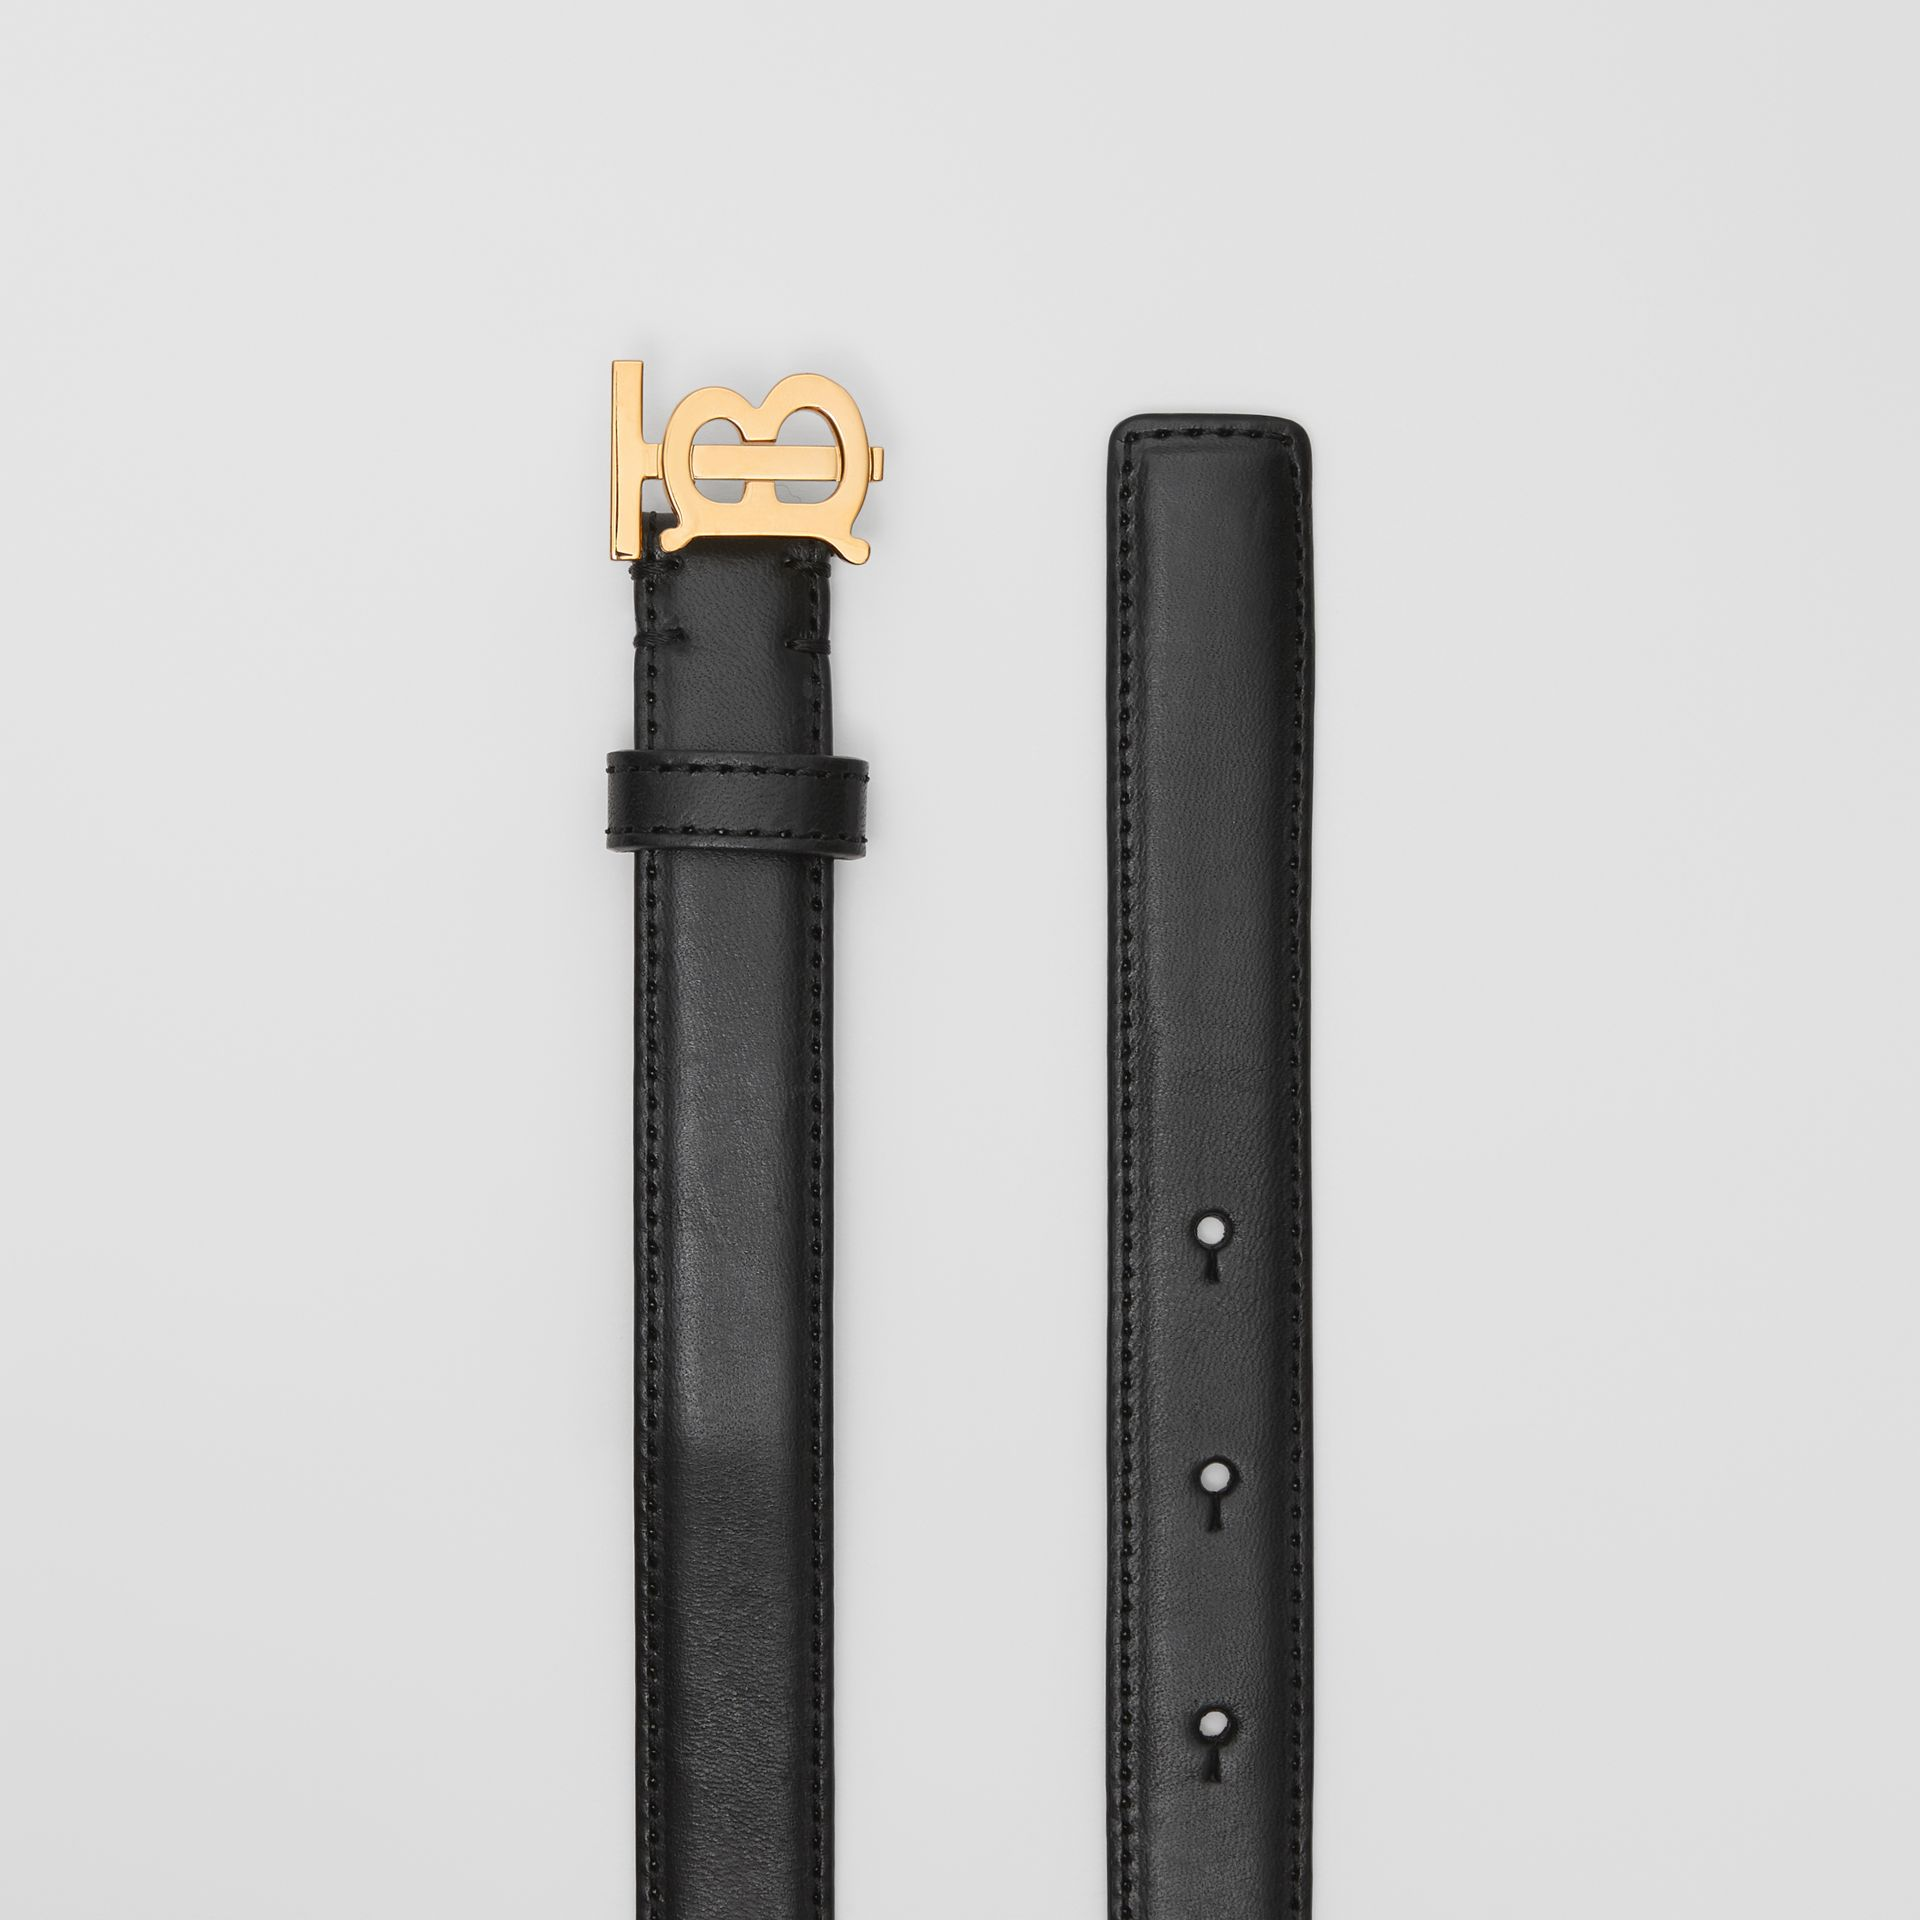 Monogram Motif Leather Belt in Black/light Gold - Women | Burberry United Kingdom - gallery image 4